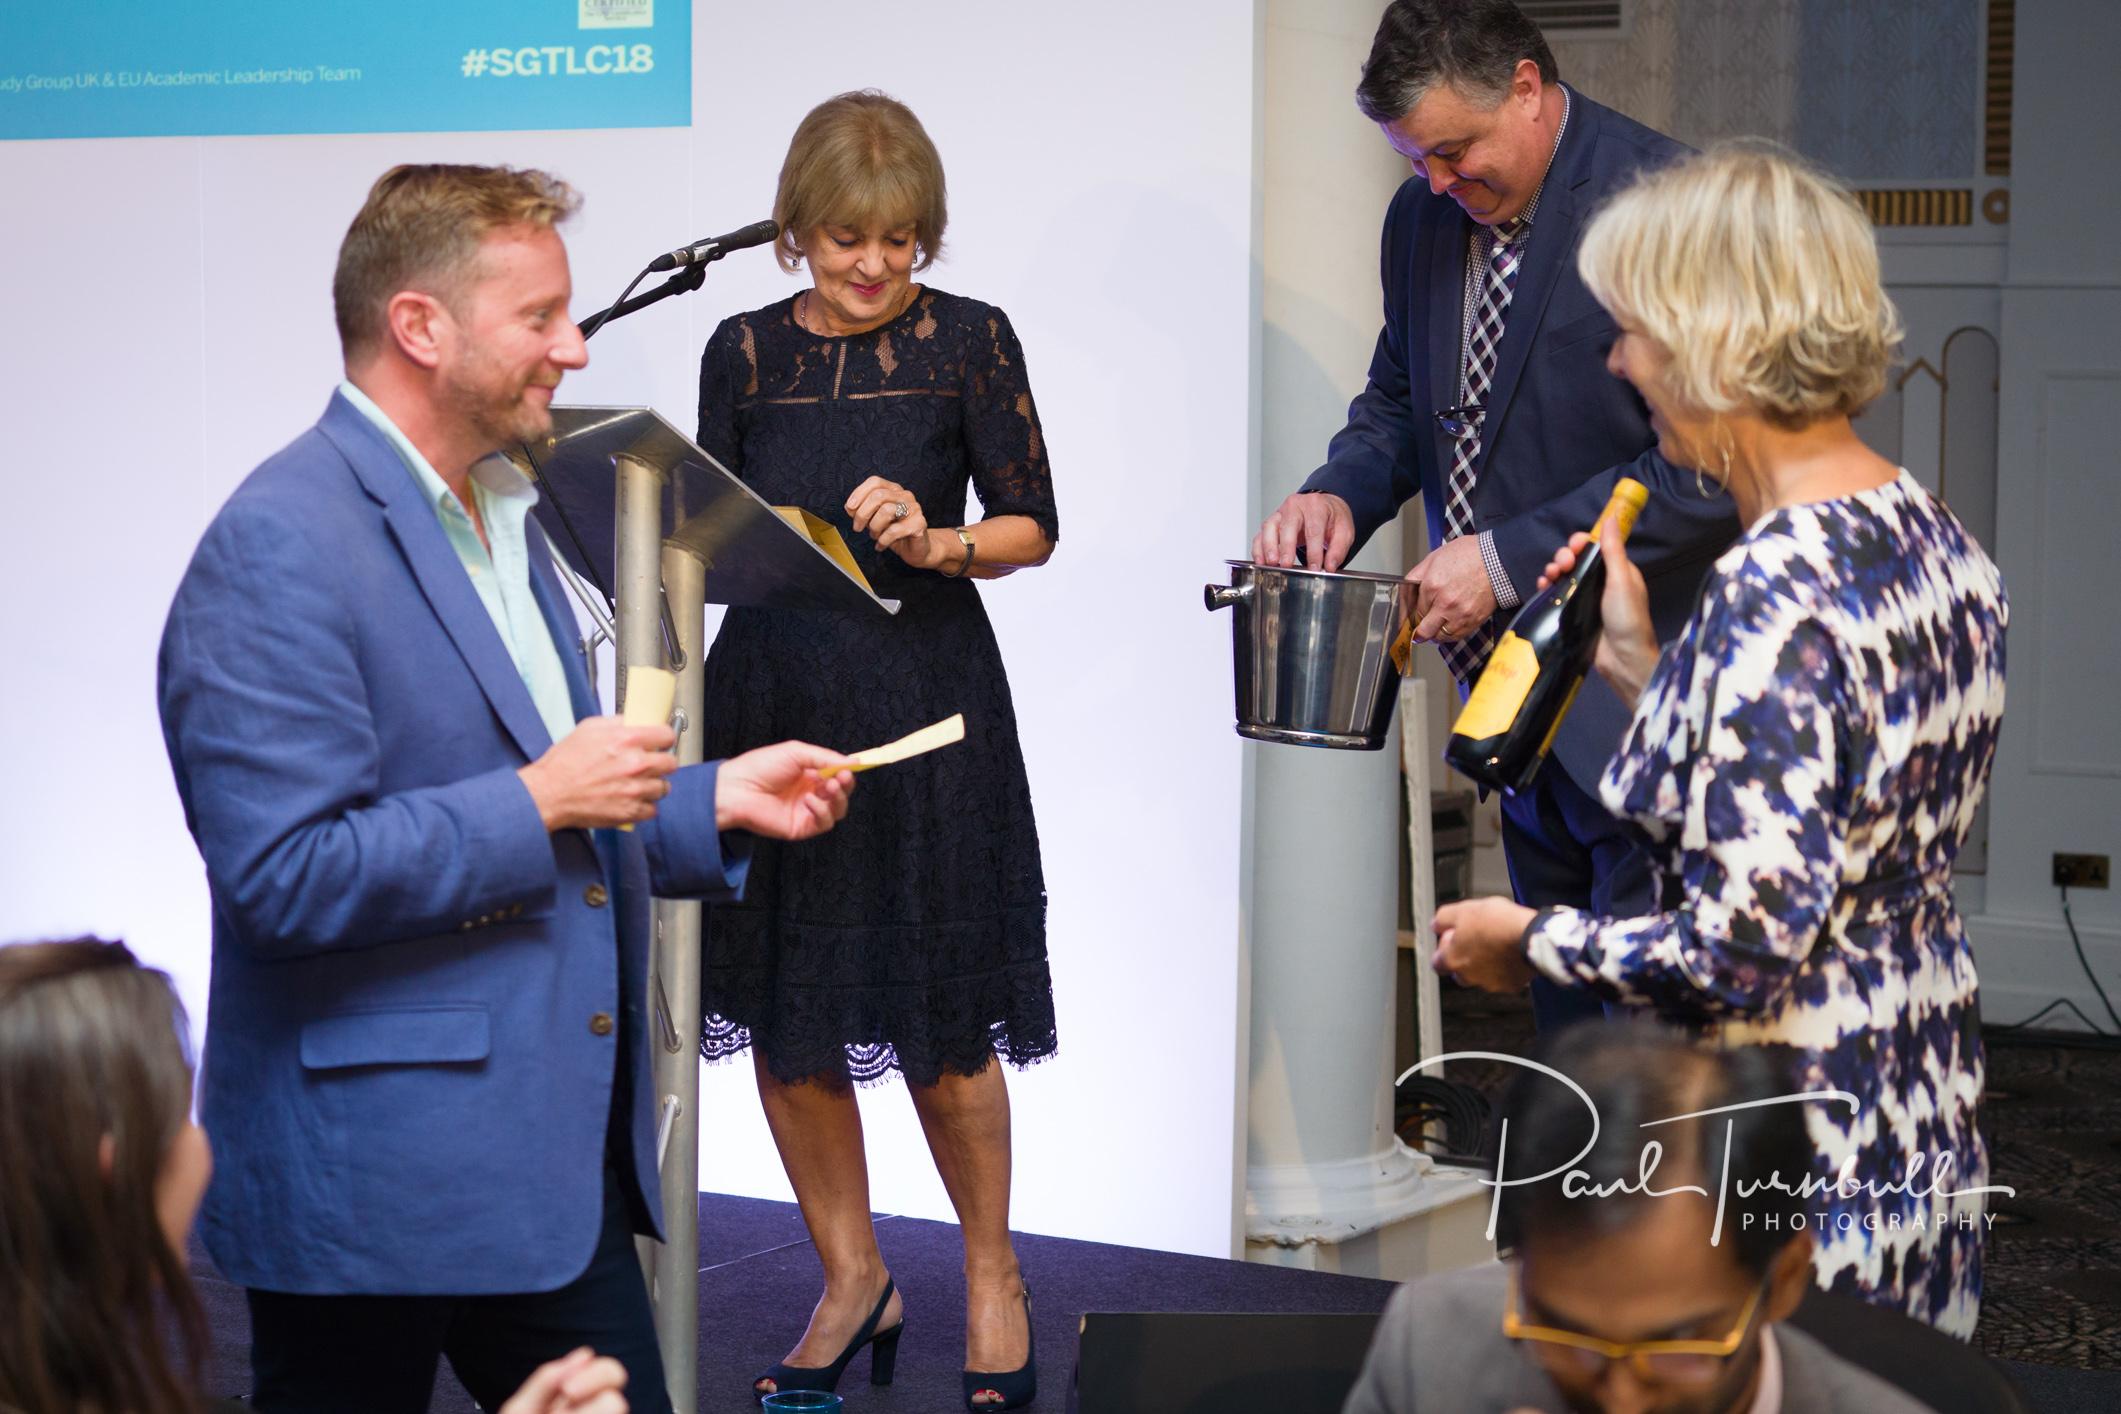 conference-event-photographer-queens-hotel-leeds-yorkshire-031.jpg